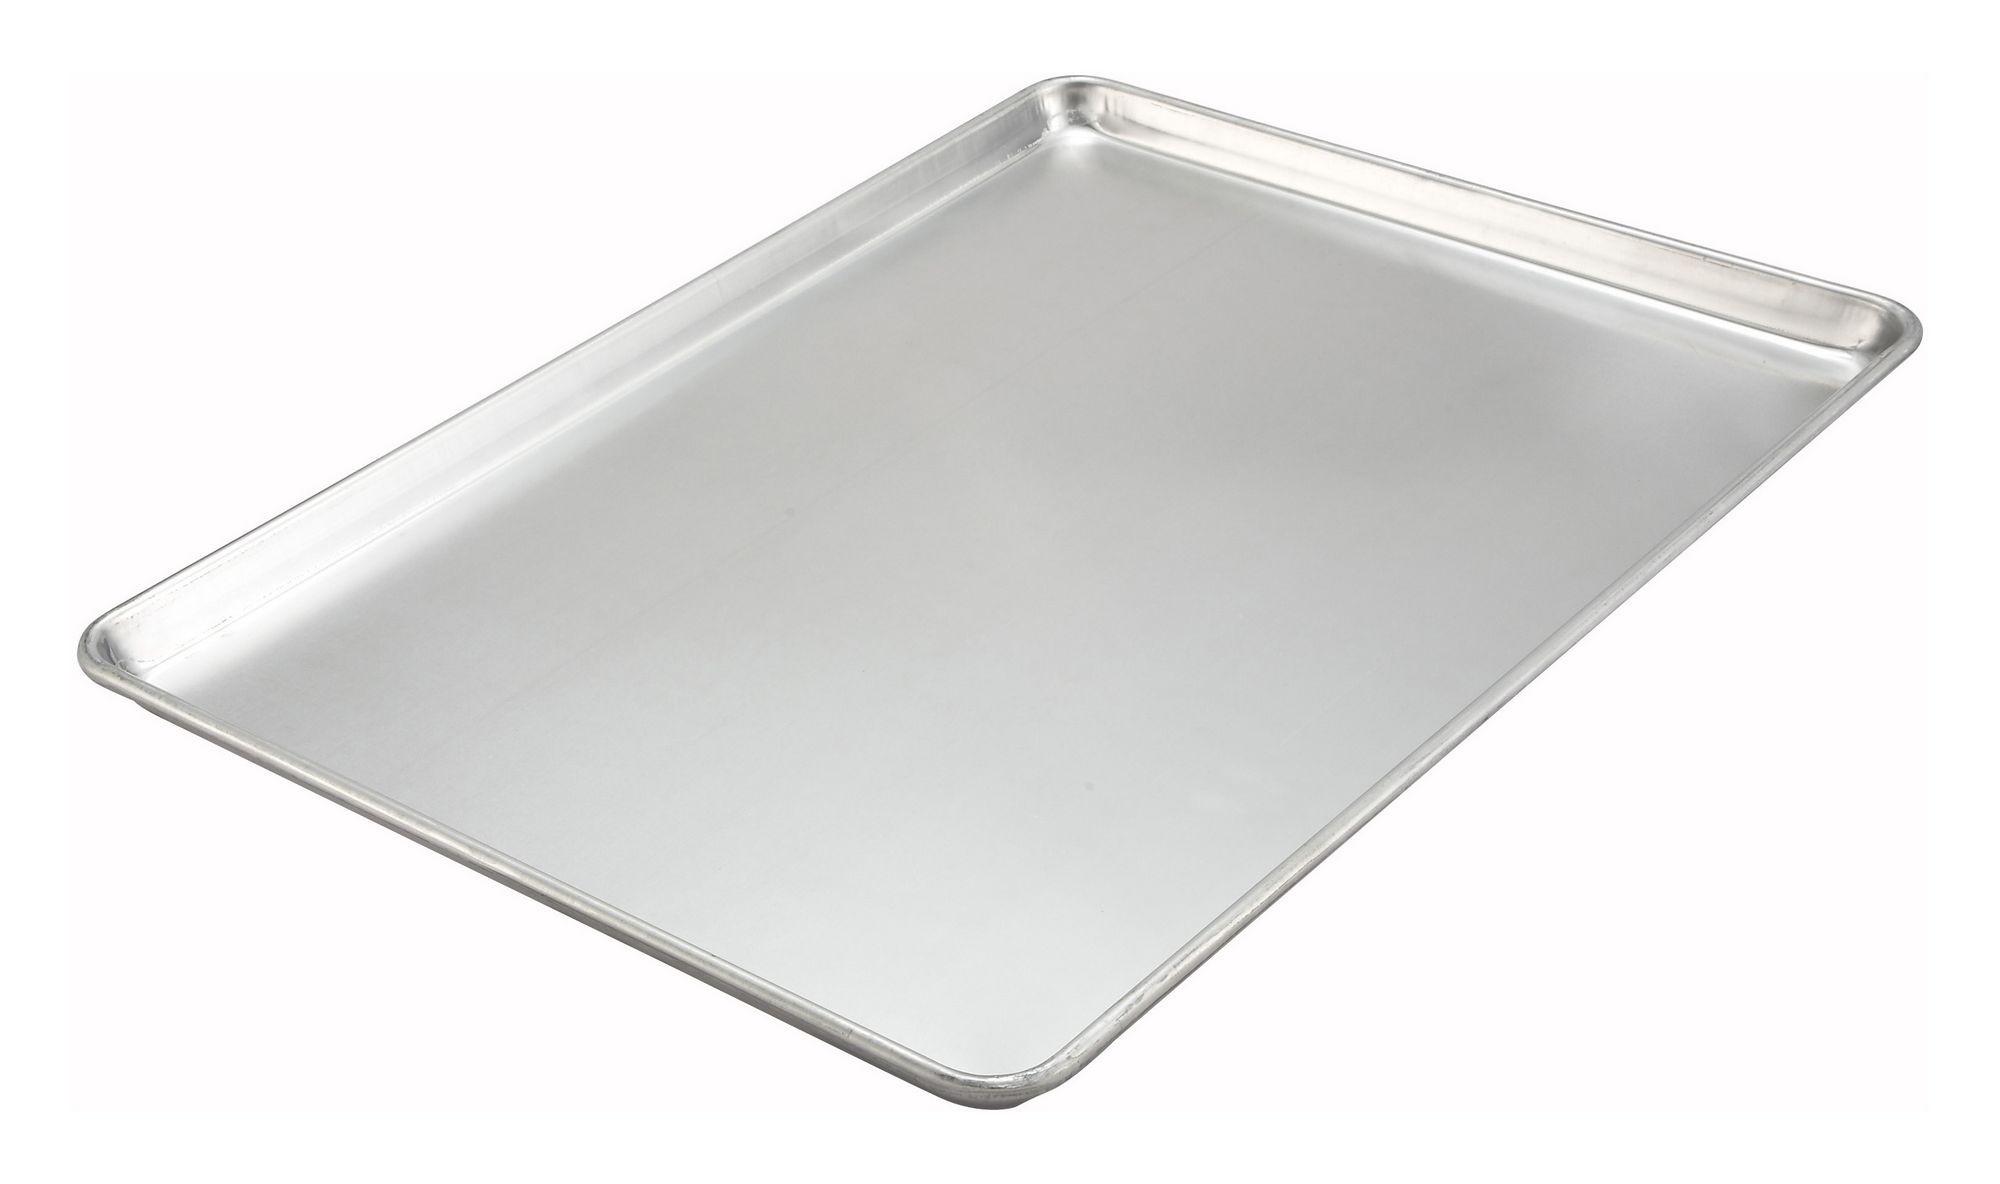 "Winco ALXP-2216H 16"" x 22"" Aluminum 18 Gauge Sheet Pan"